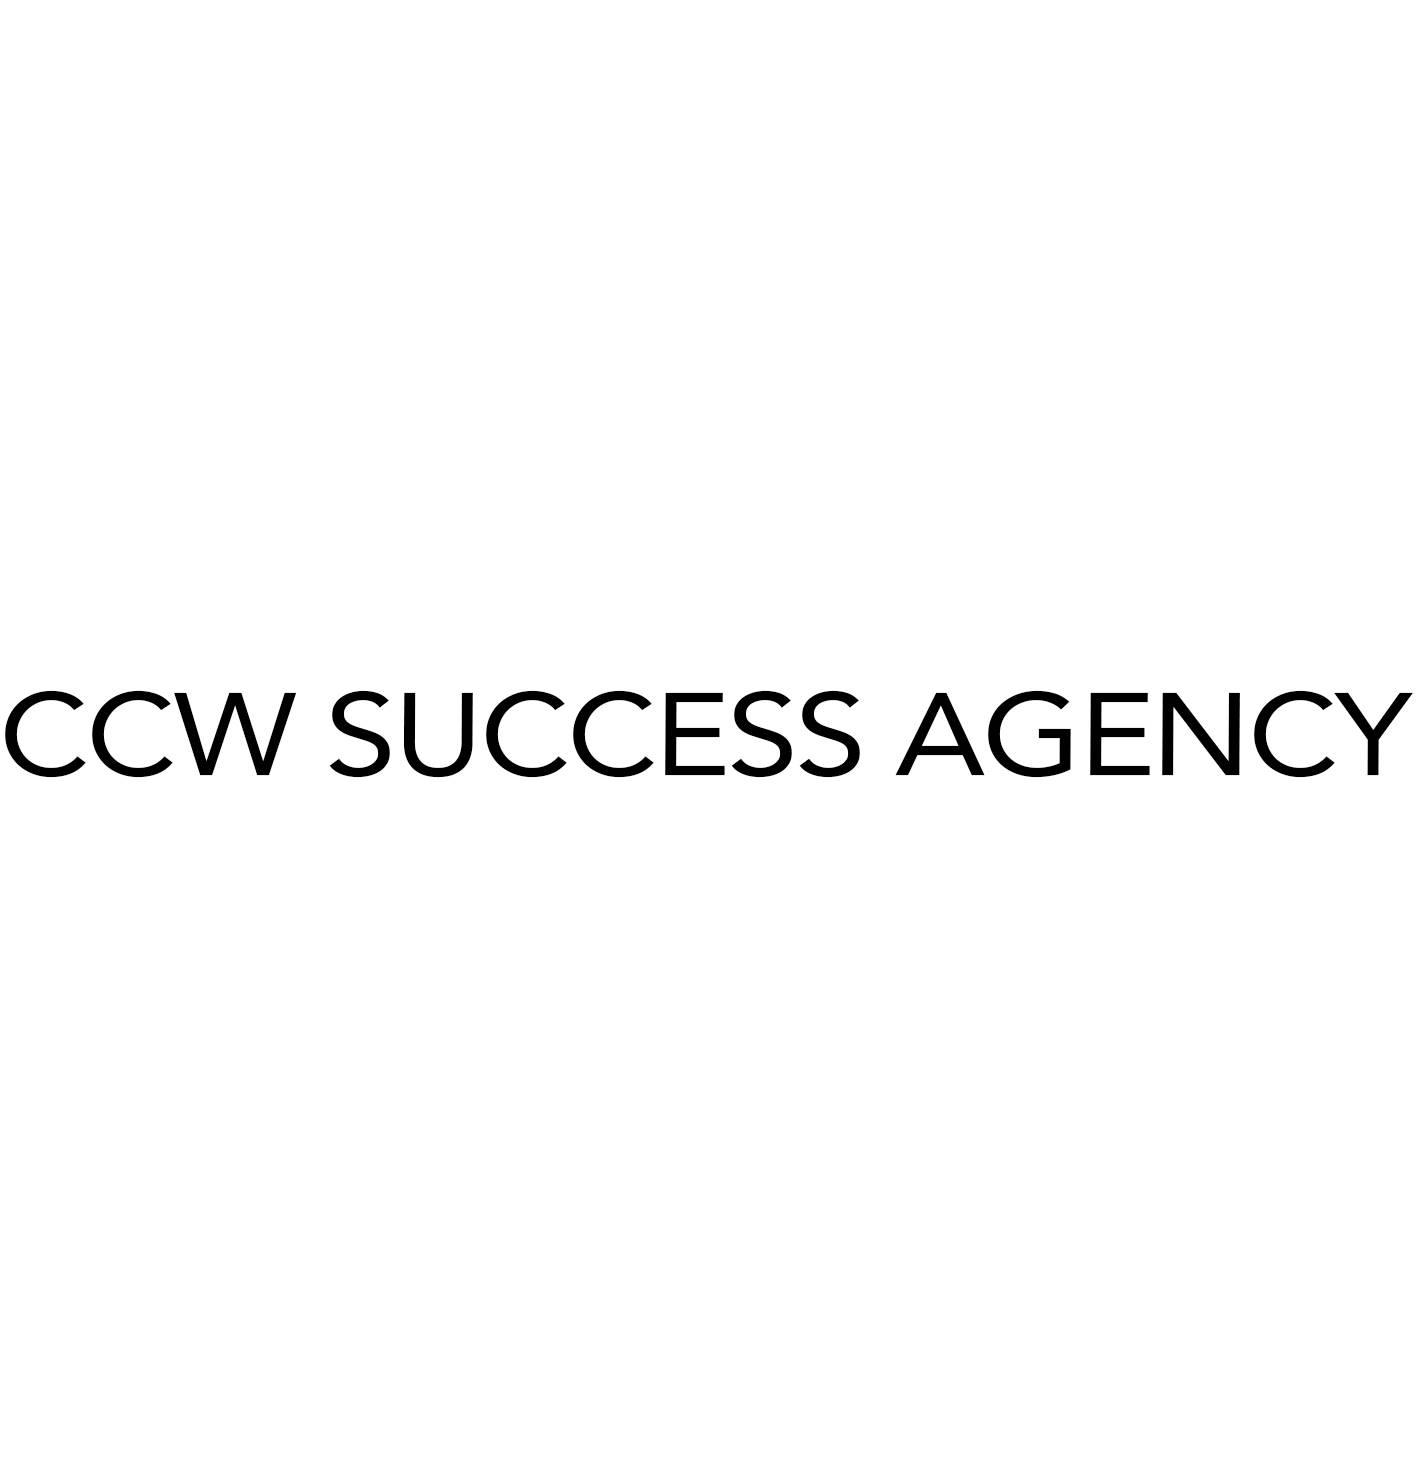 CCW Success Agency